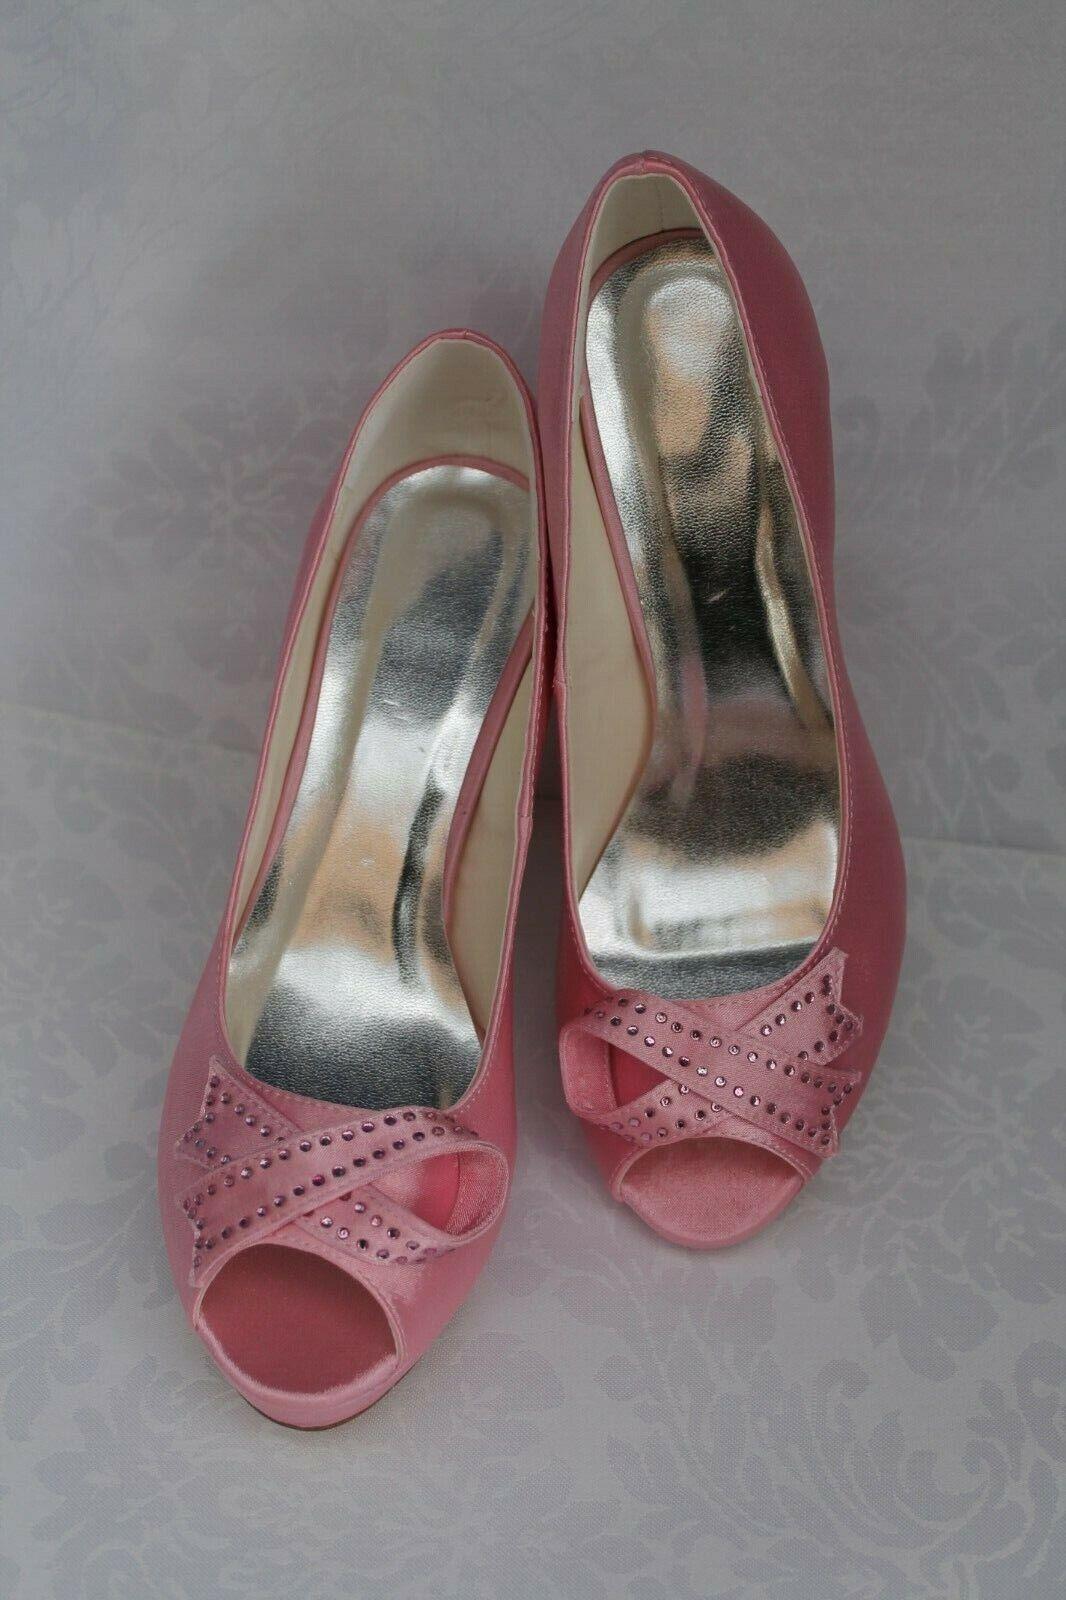 Womens Bridal Shoes Prom Shoes Party Pumps Pink 38 Peep Toe Bridesmaid B Ware